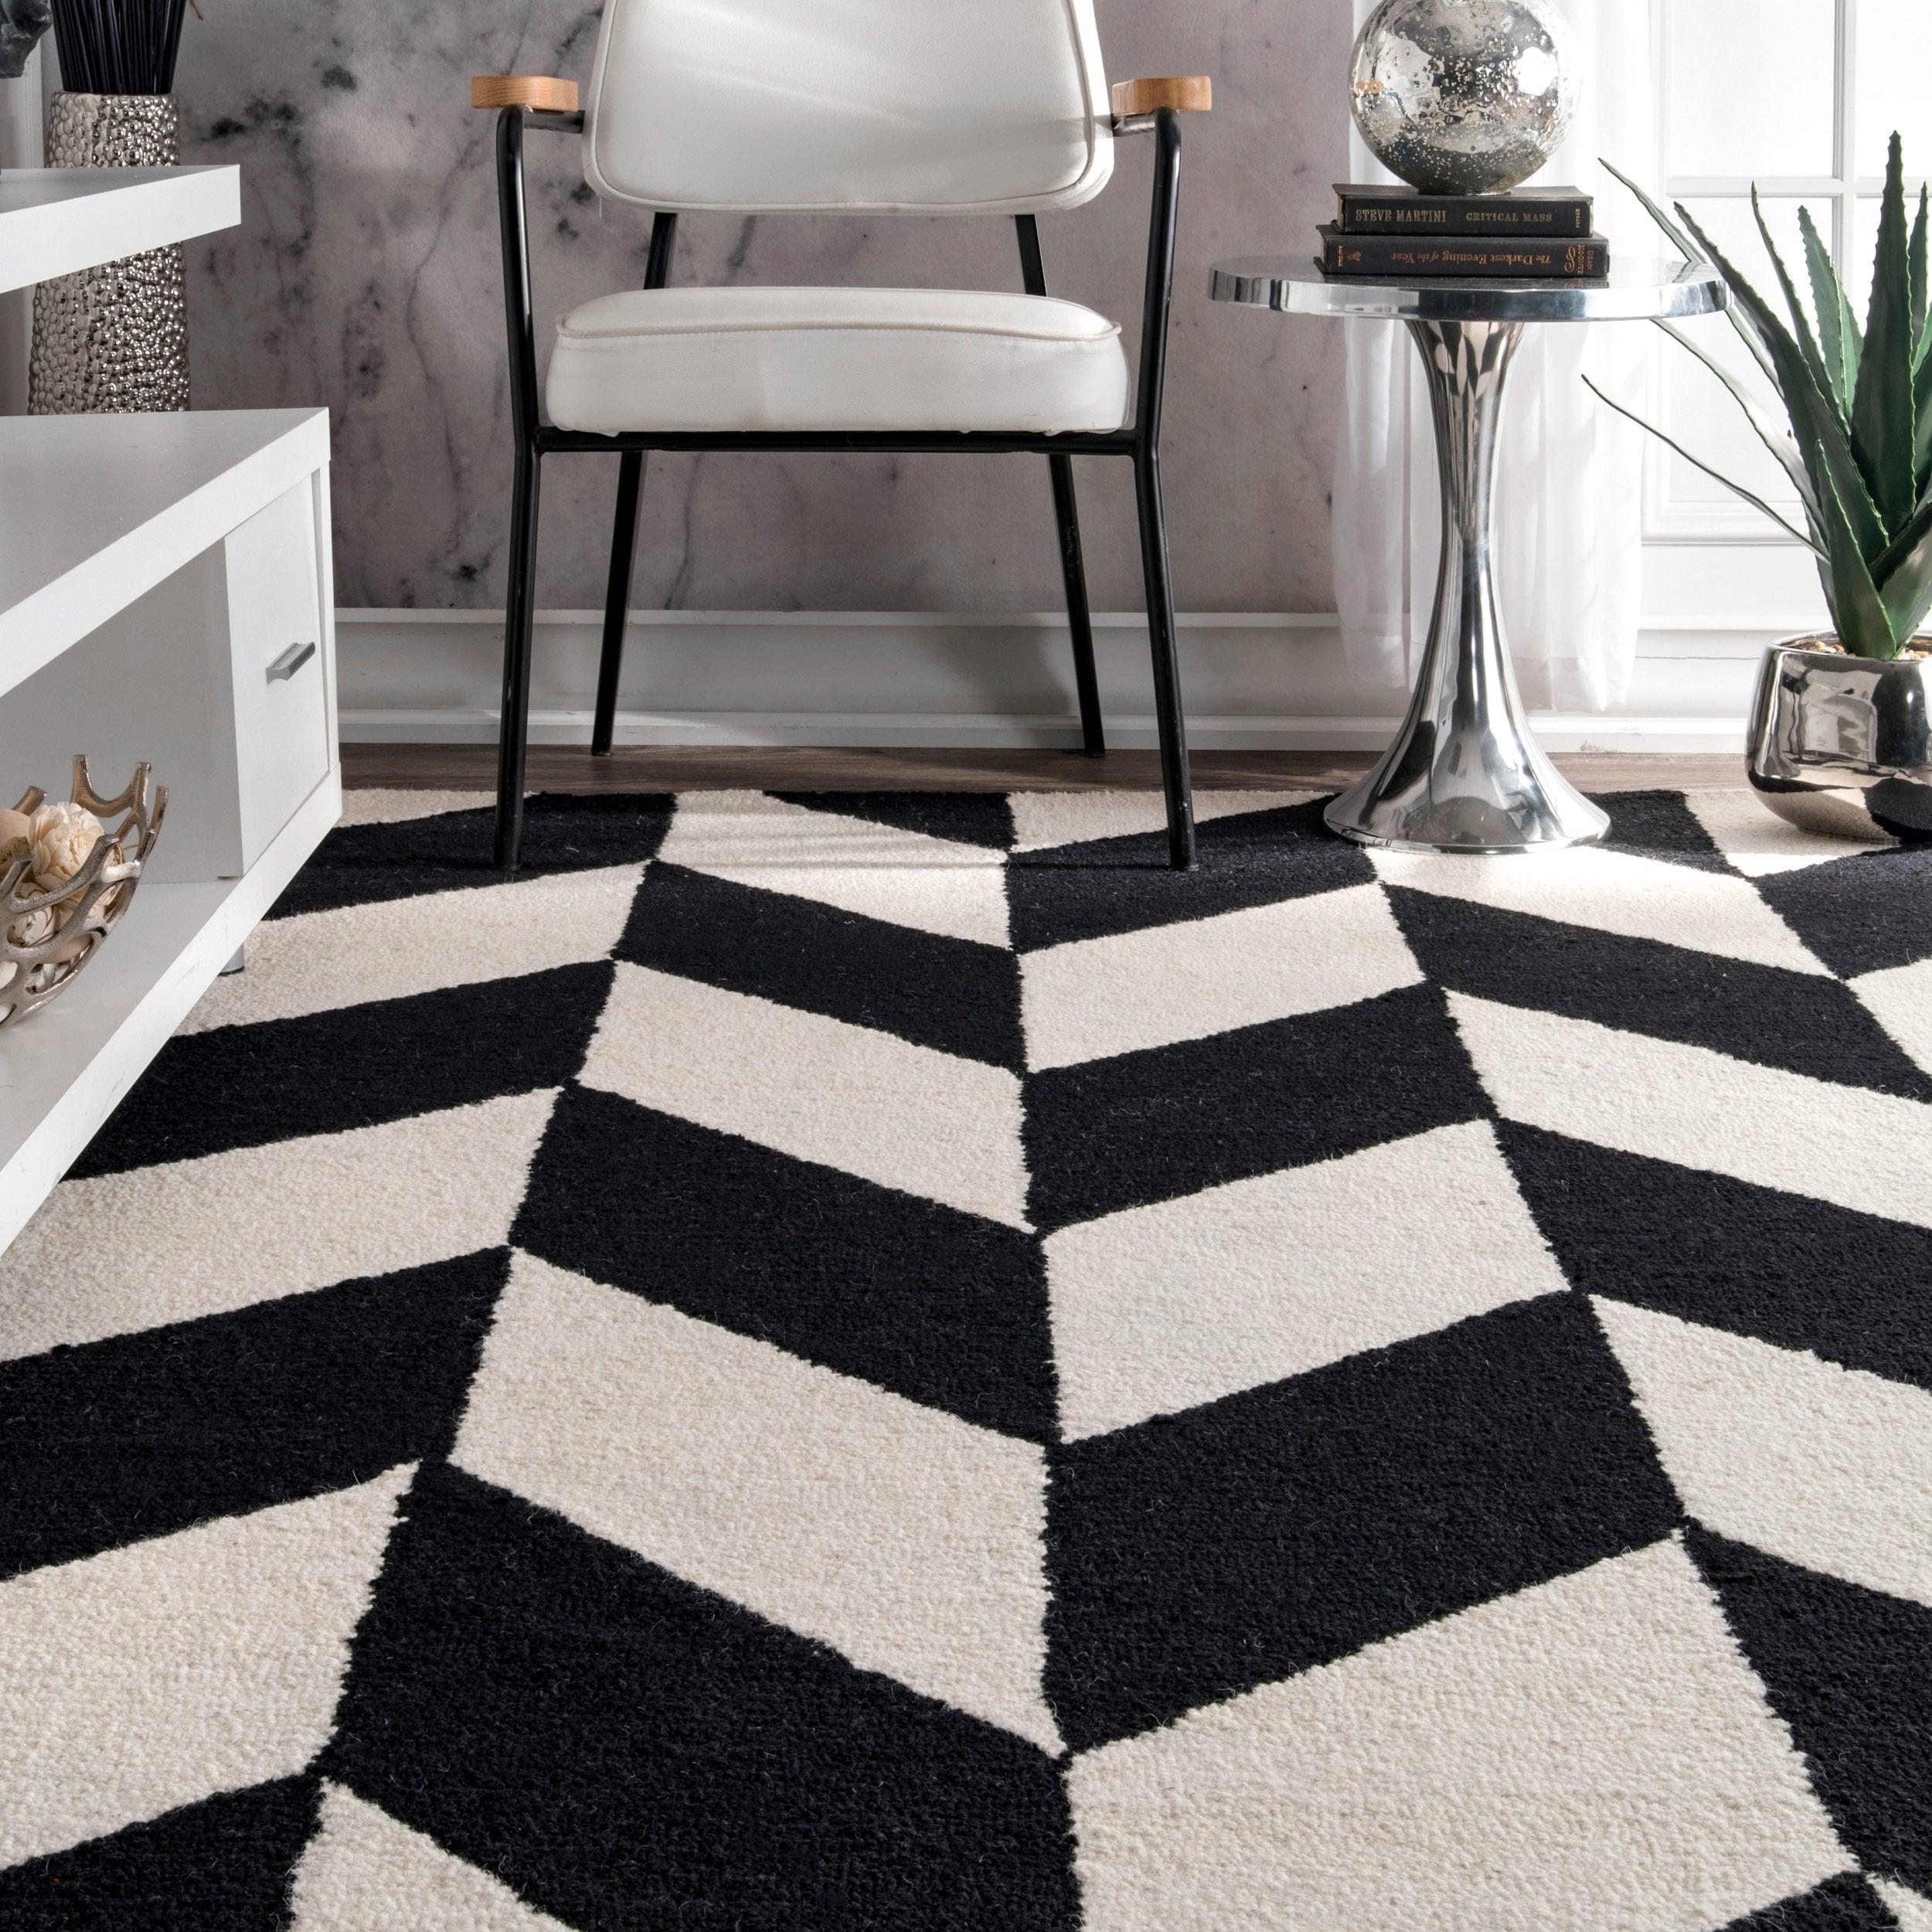 nuLOOM-Black-and-White-Handmade-Mod-Tiles-Wool-Area-Rug thumbnail 8